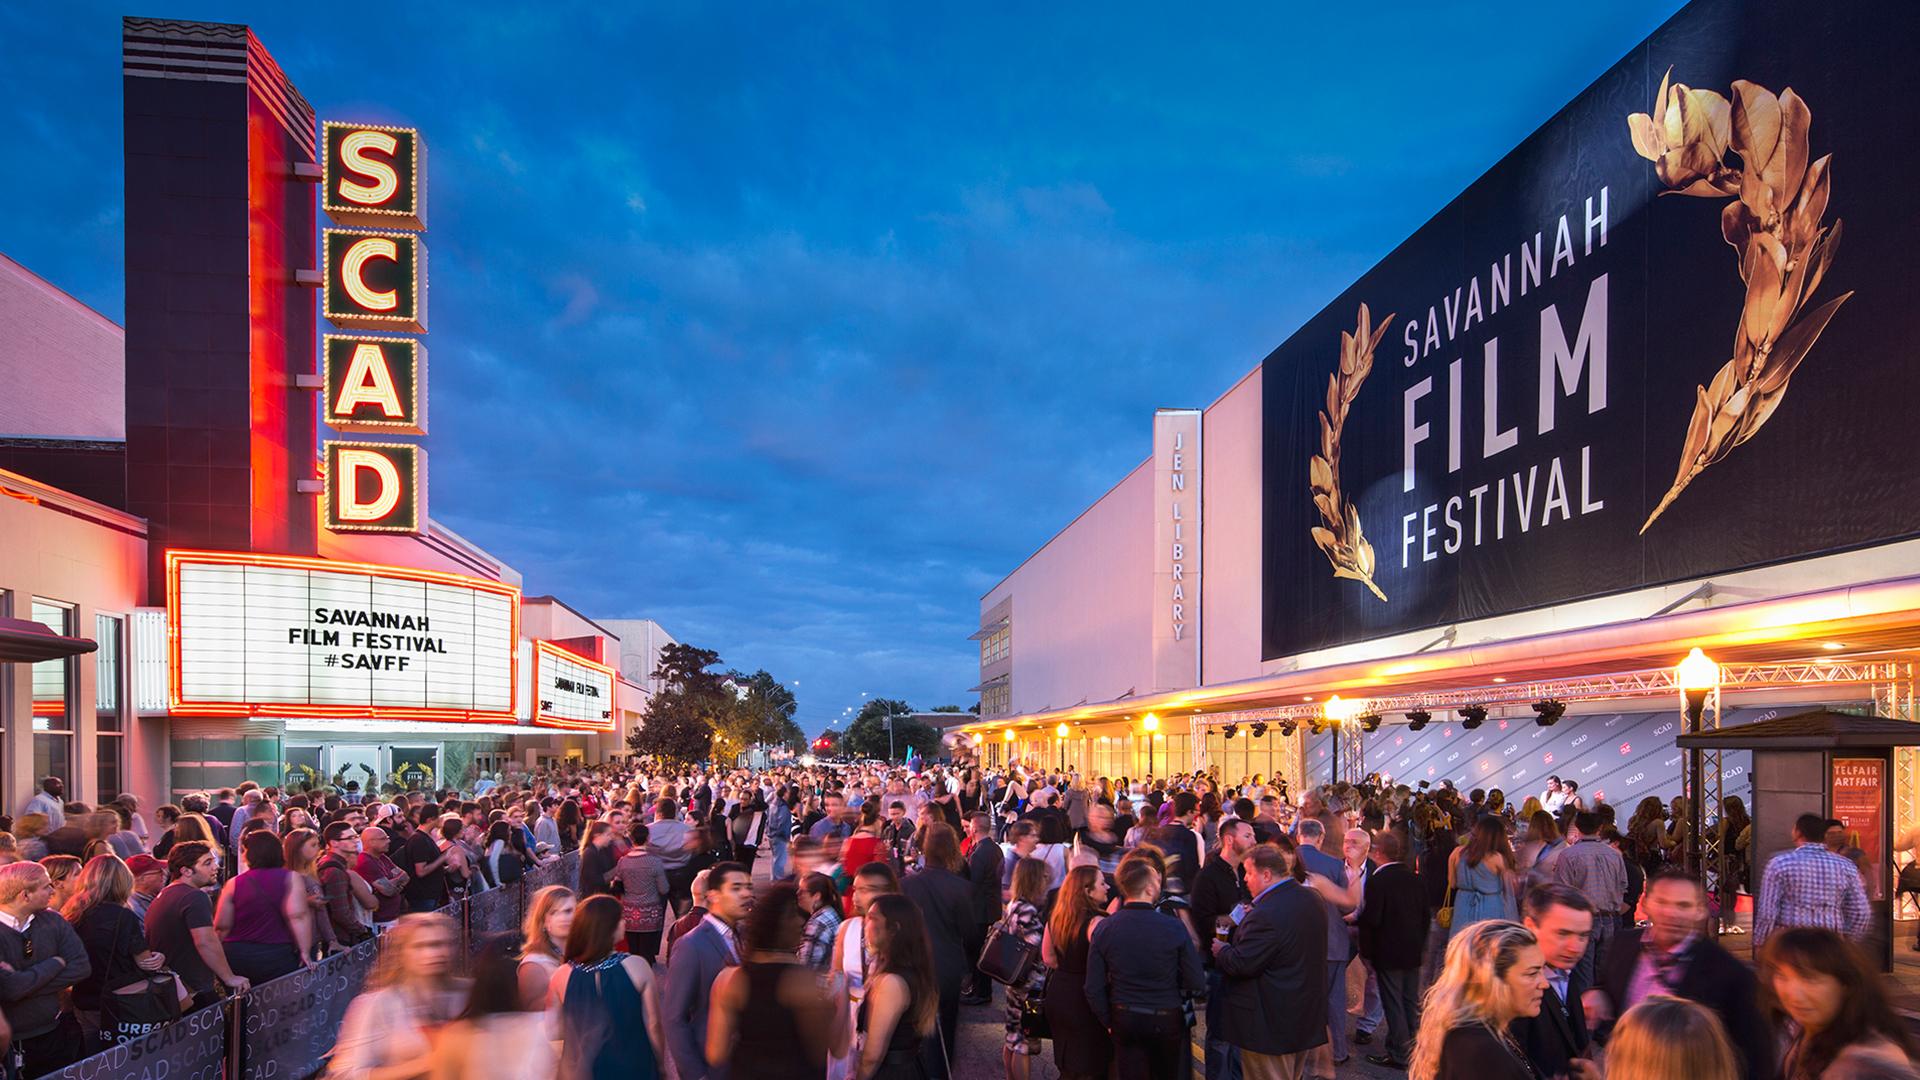 Film festivals: Marketing champion of world cinema